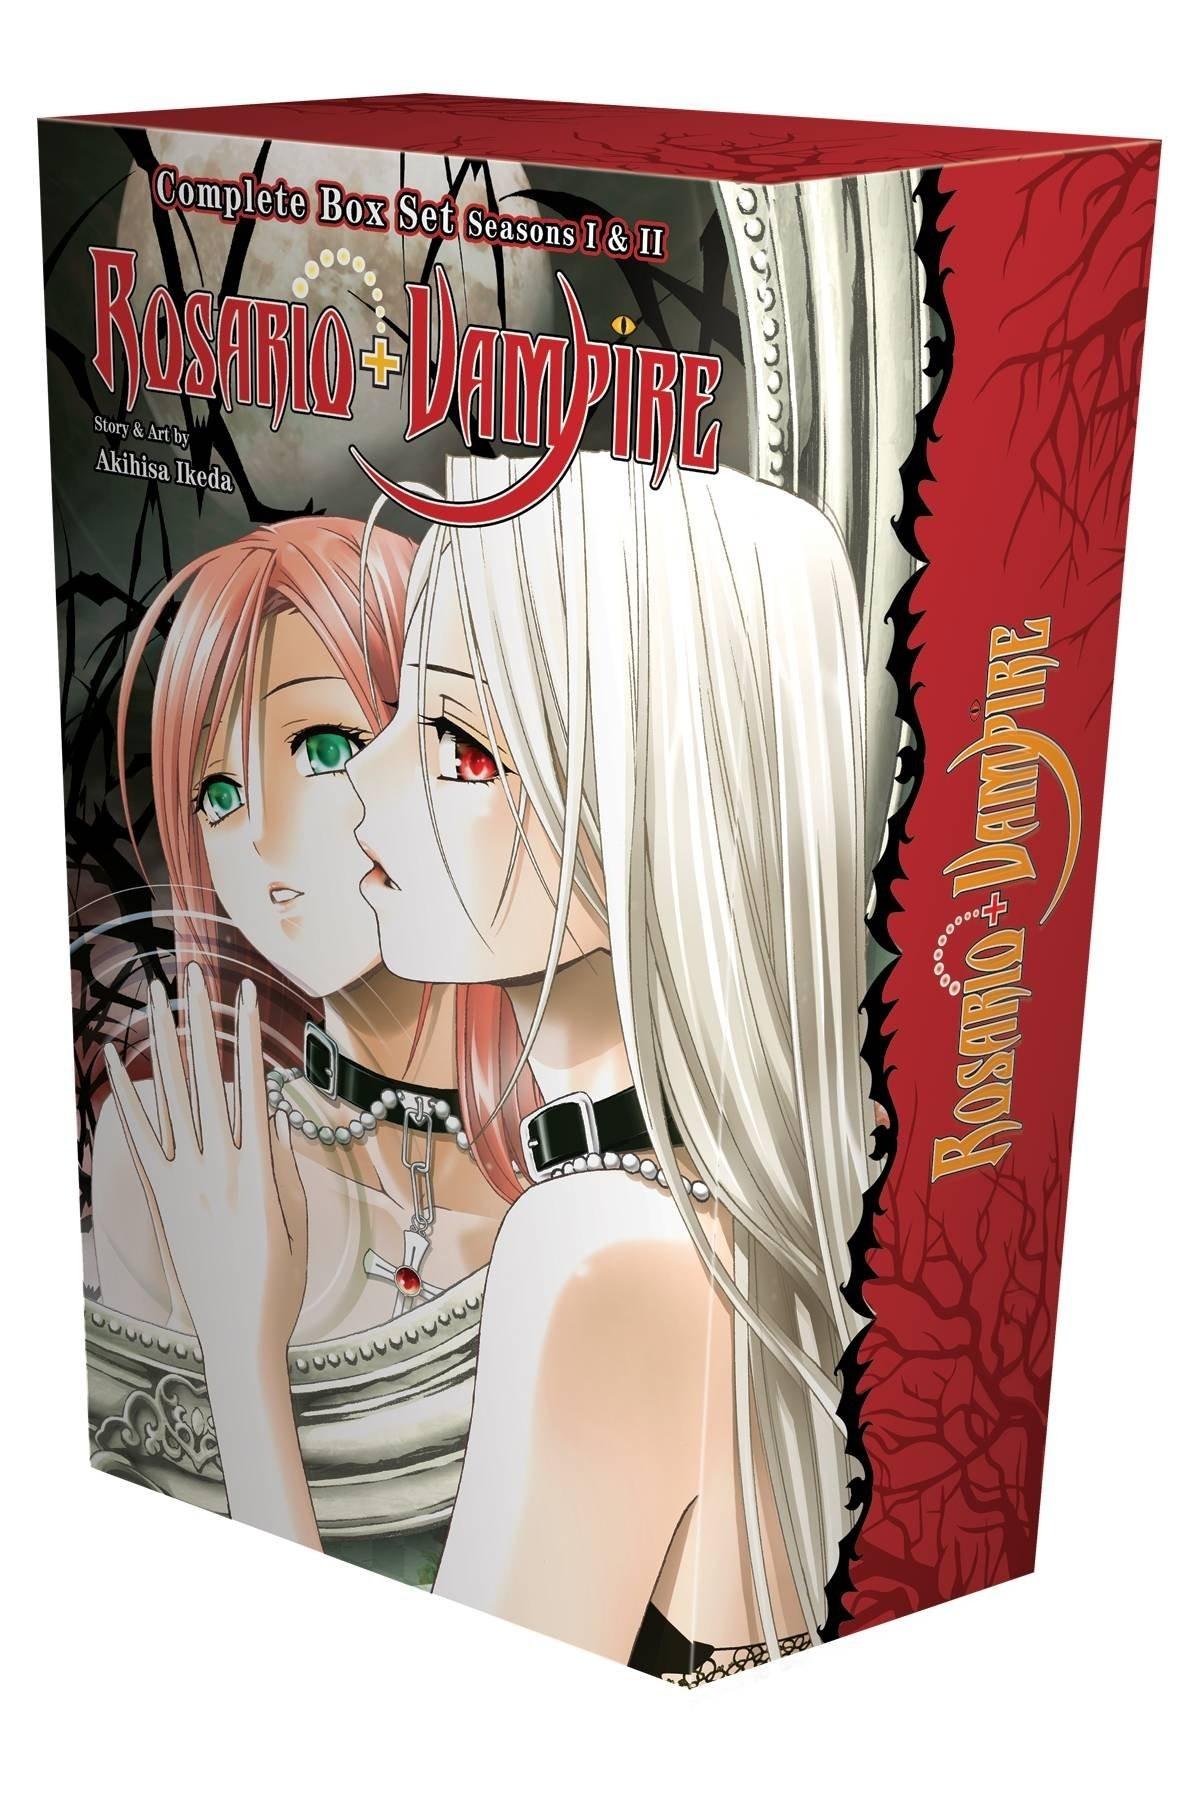 Rosario + Vampire, Complete Box Set (Volumes 1-10 and Season II Volumes 1-14)